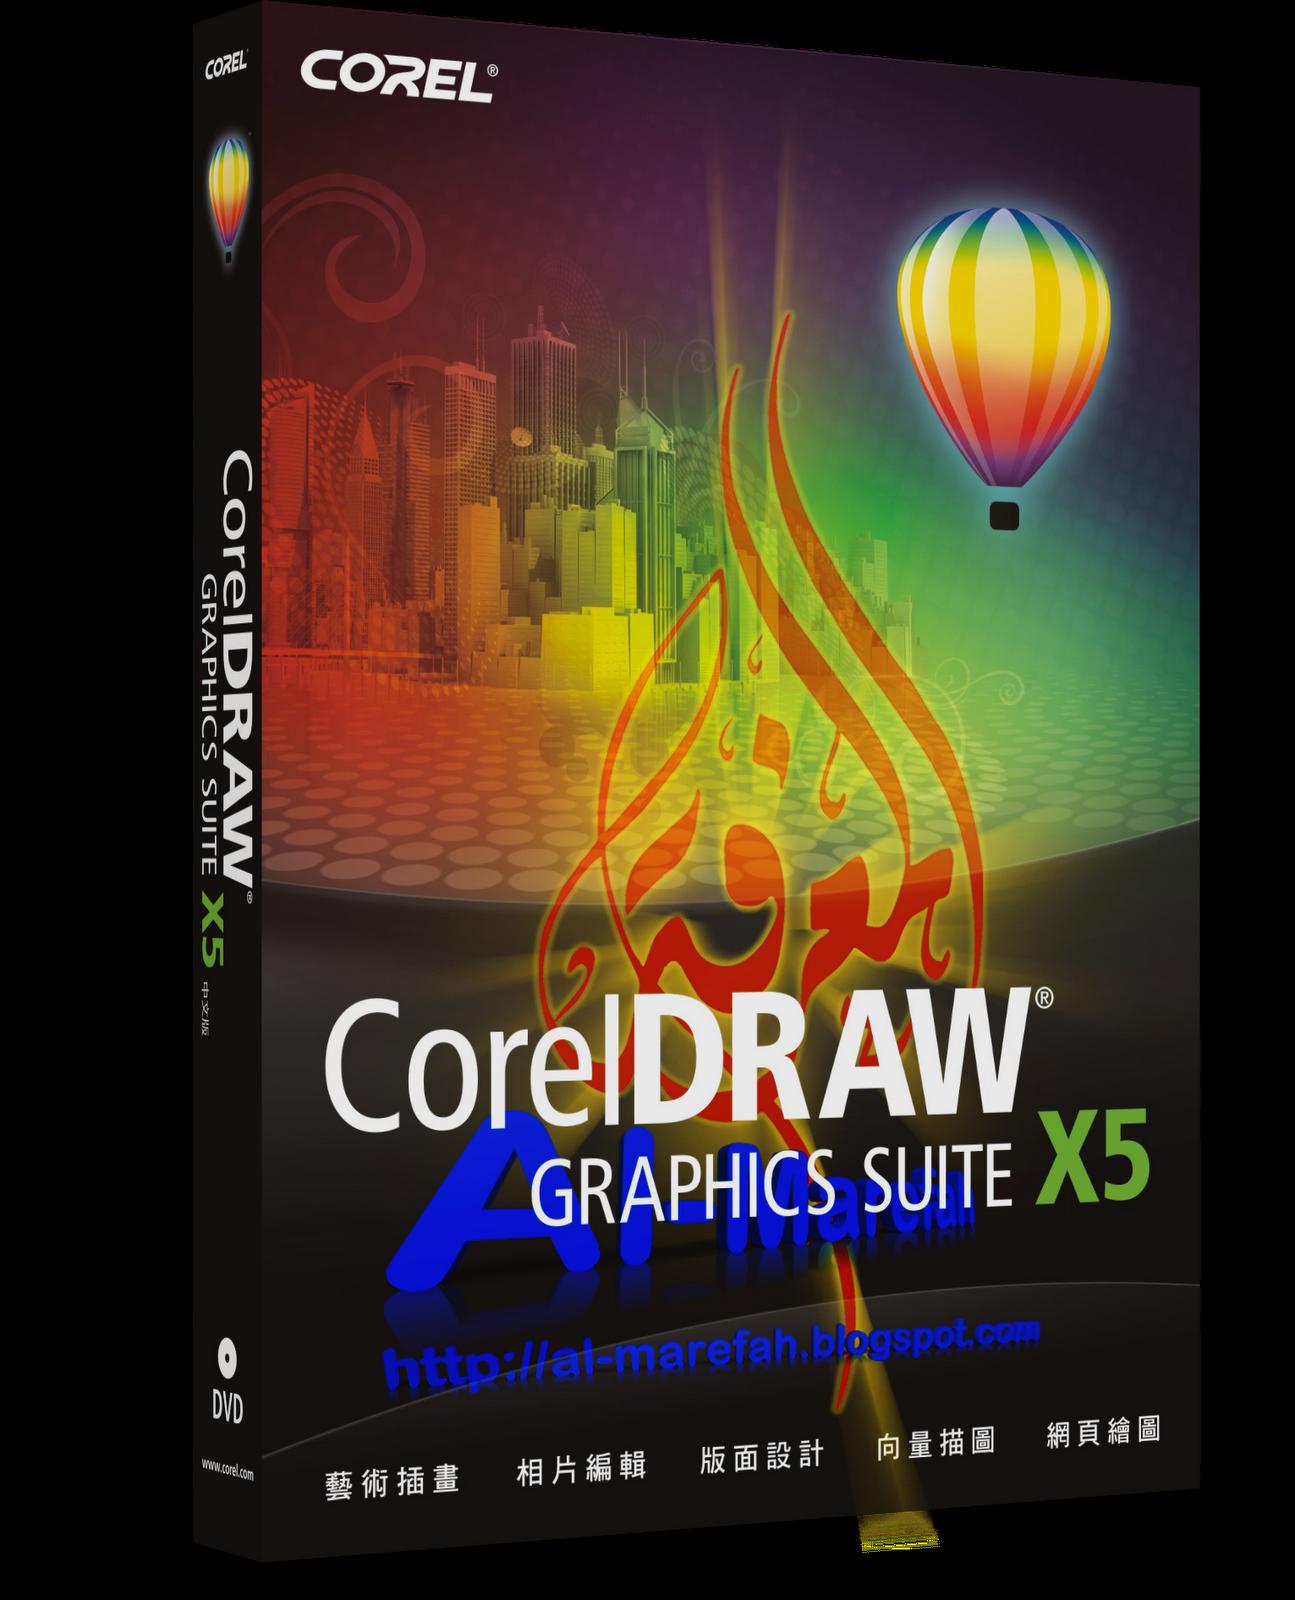 Download Corel Draw X5 Portable : download, corel, portable, Software, Download, Version, Corel, Graphics, Suite, Portable